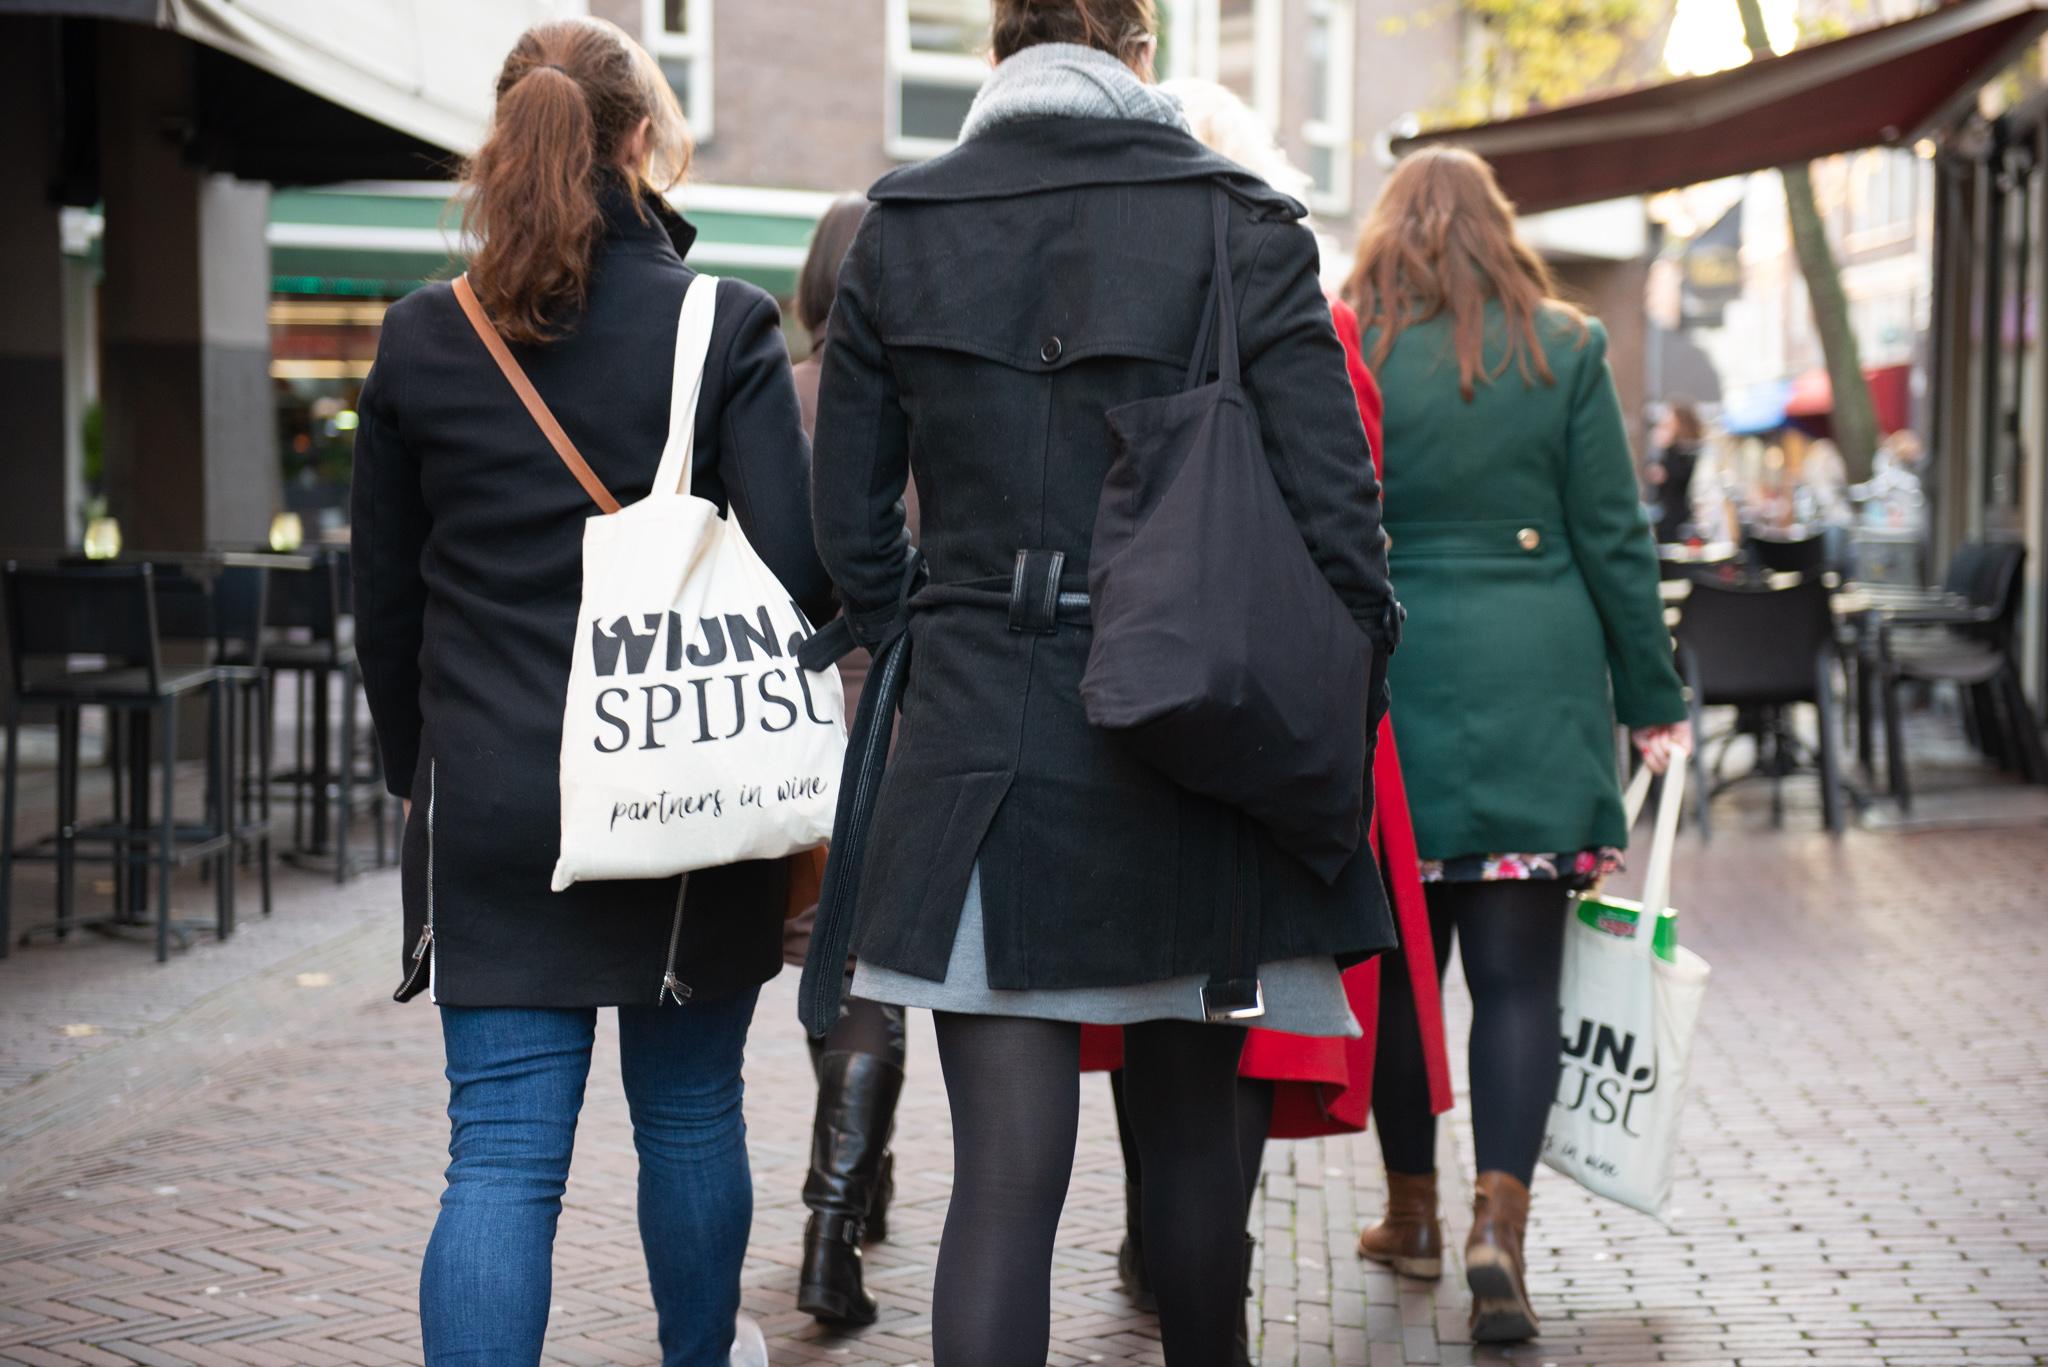 Den Bosch | Illegaal culinair wandelen nu toch toegestaan